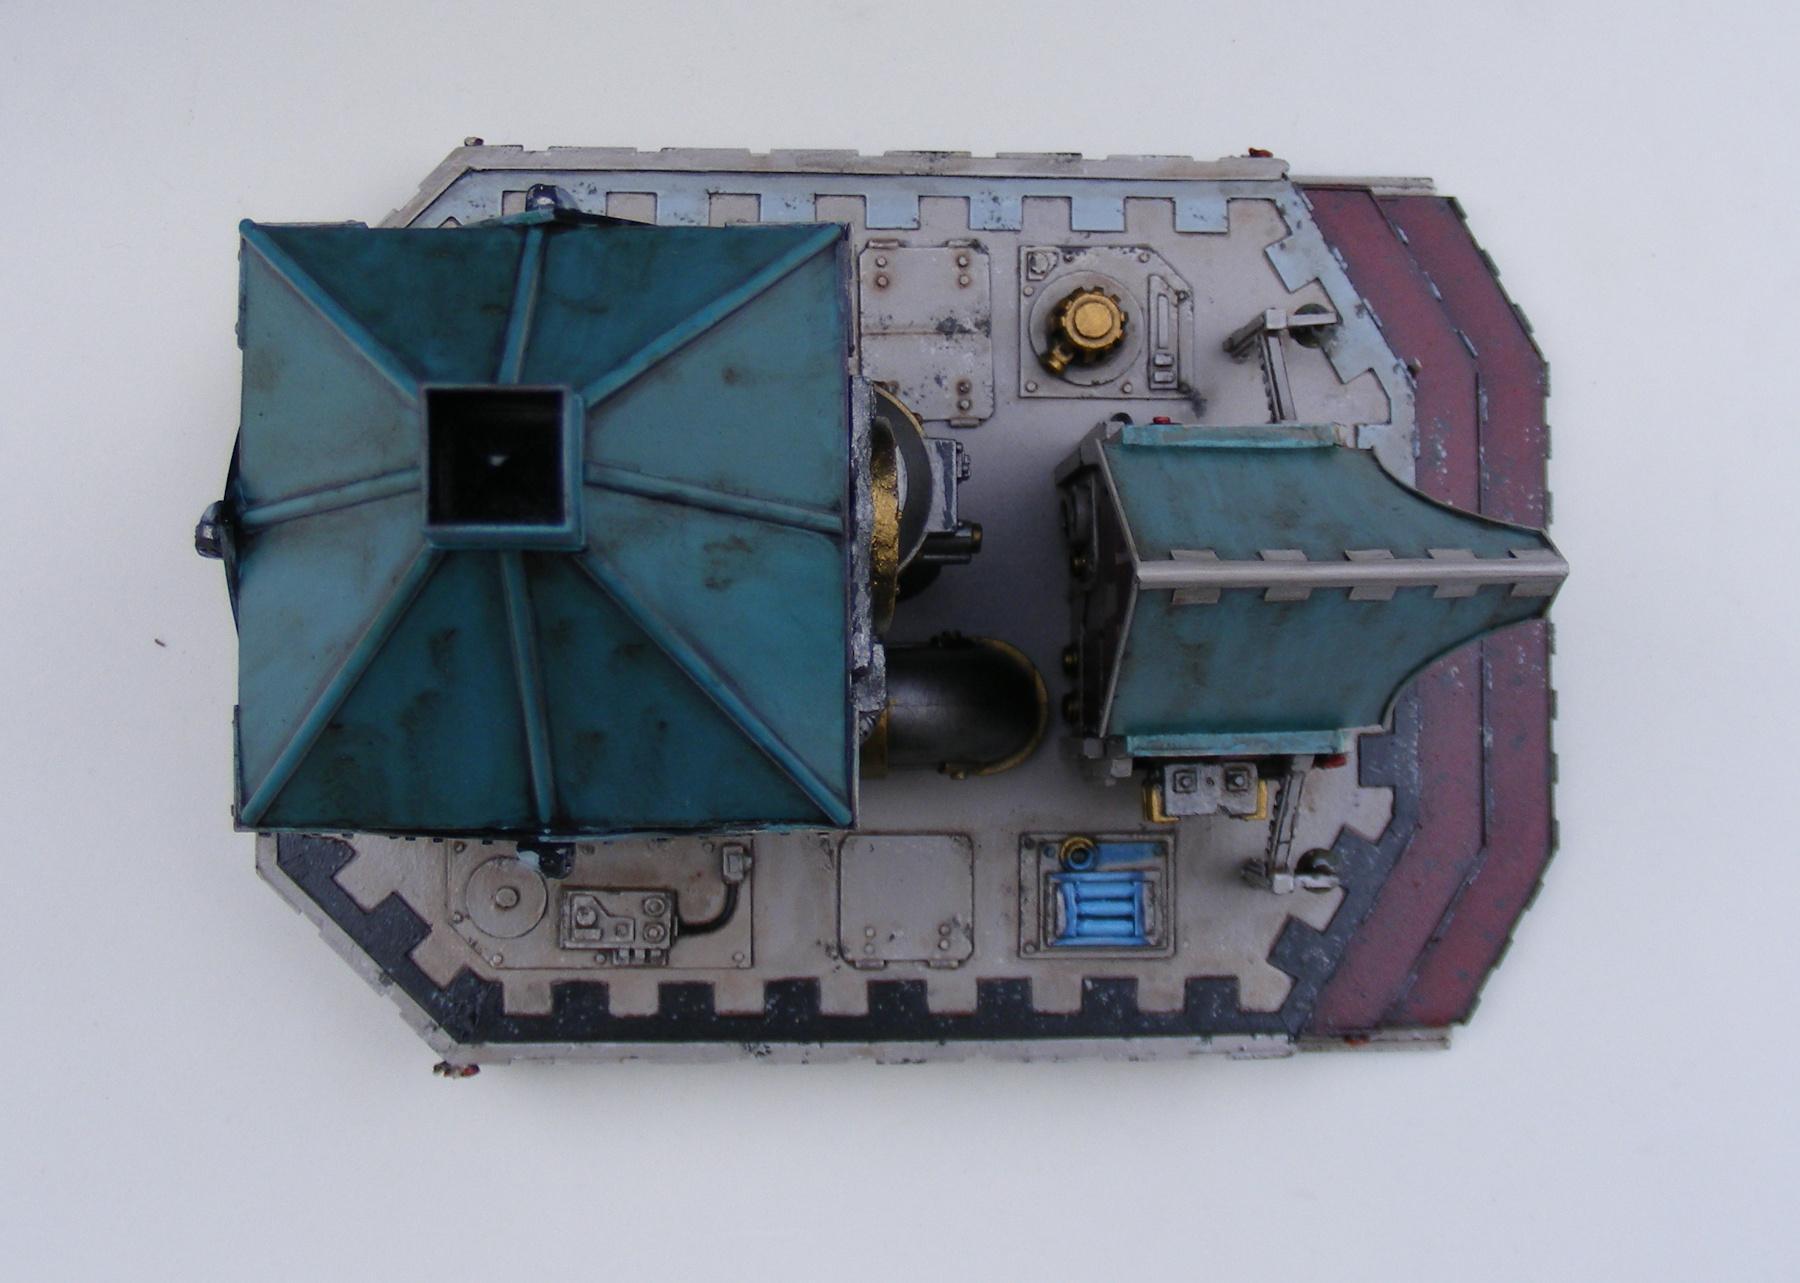 Mechanicus, Terrain, Warhammer 40,000